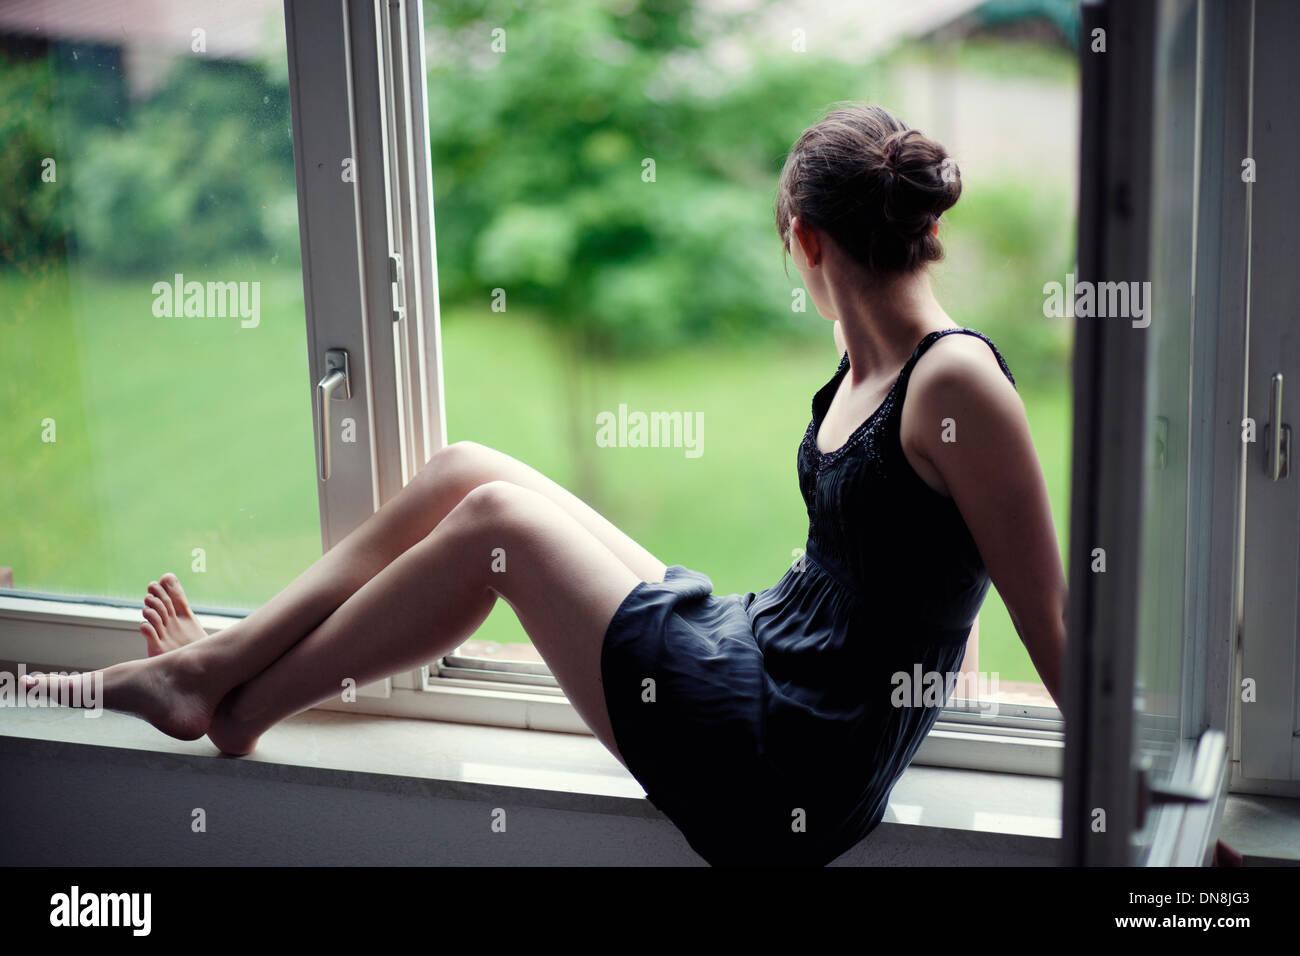 Mujer joven sentada sobre un alféizar Foto de stock